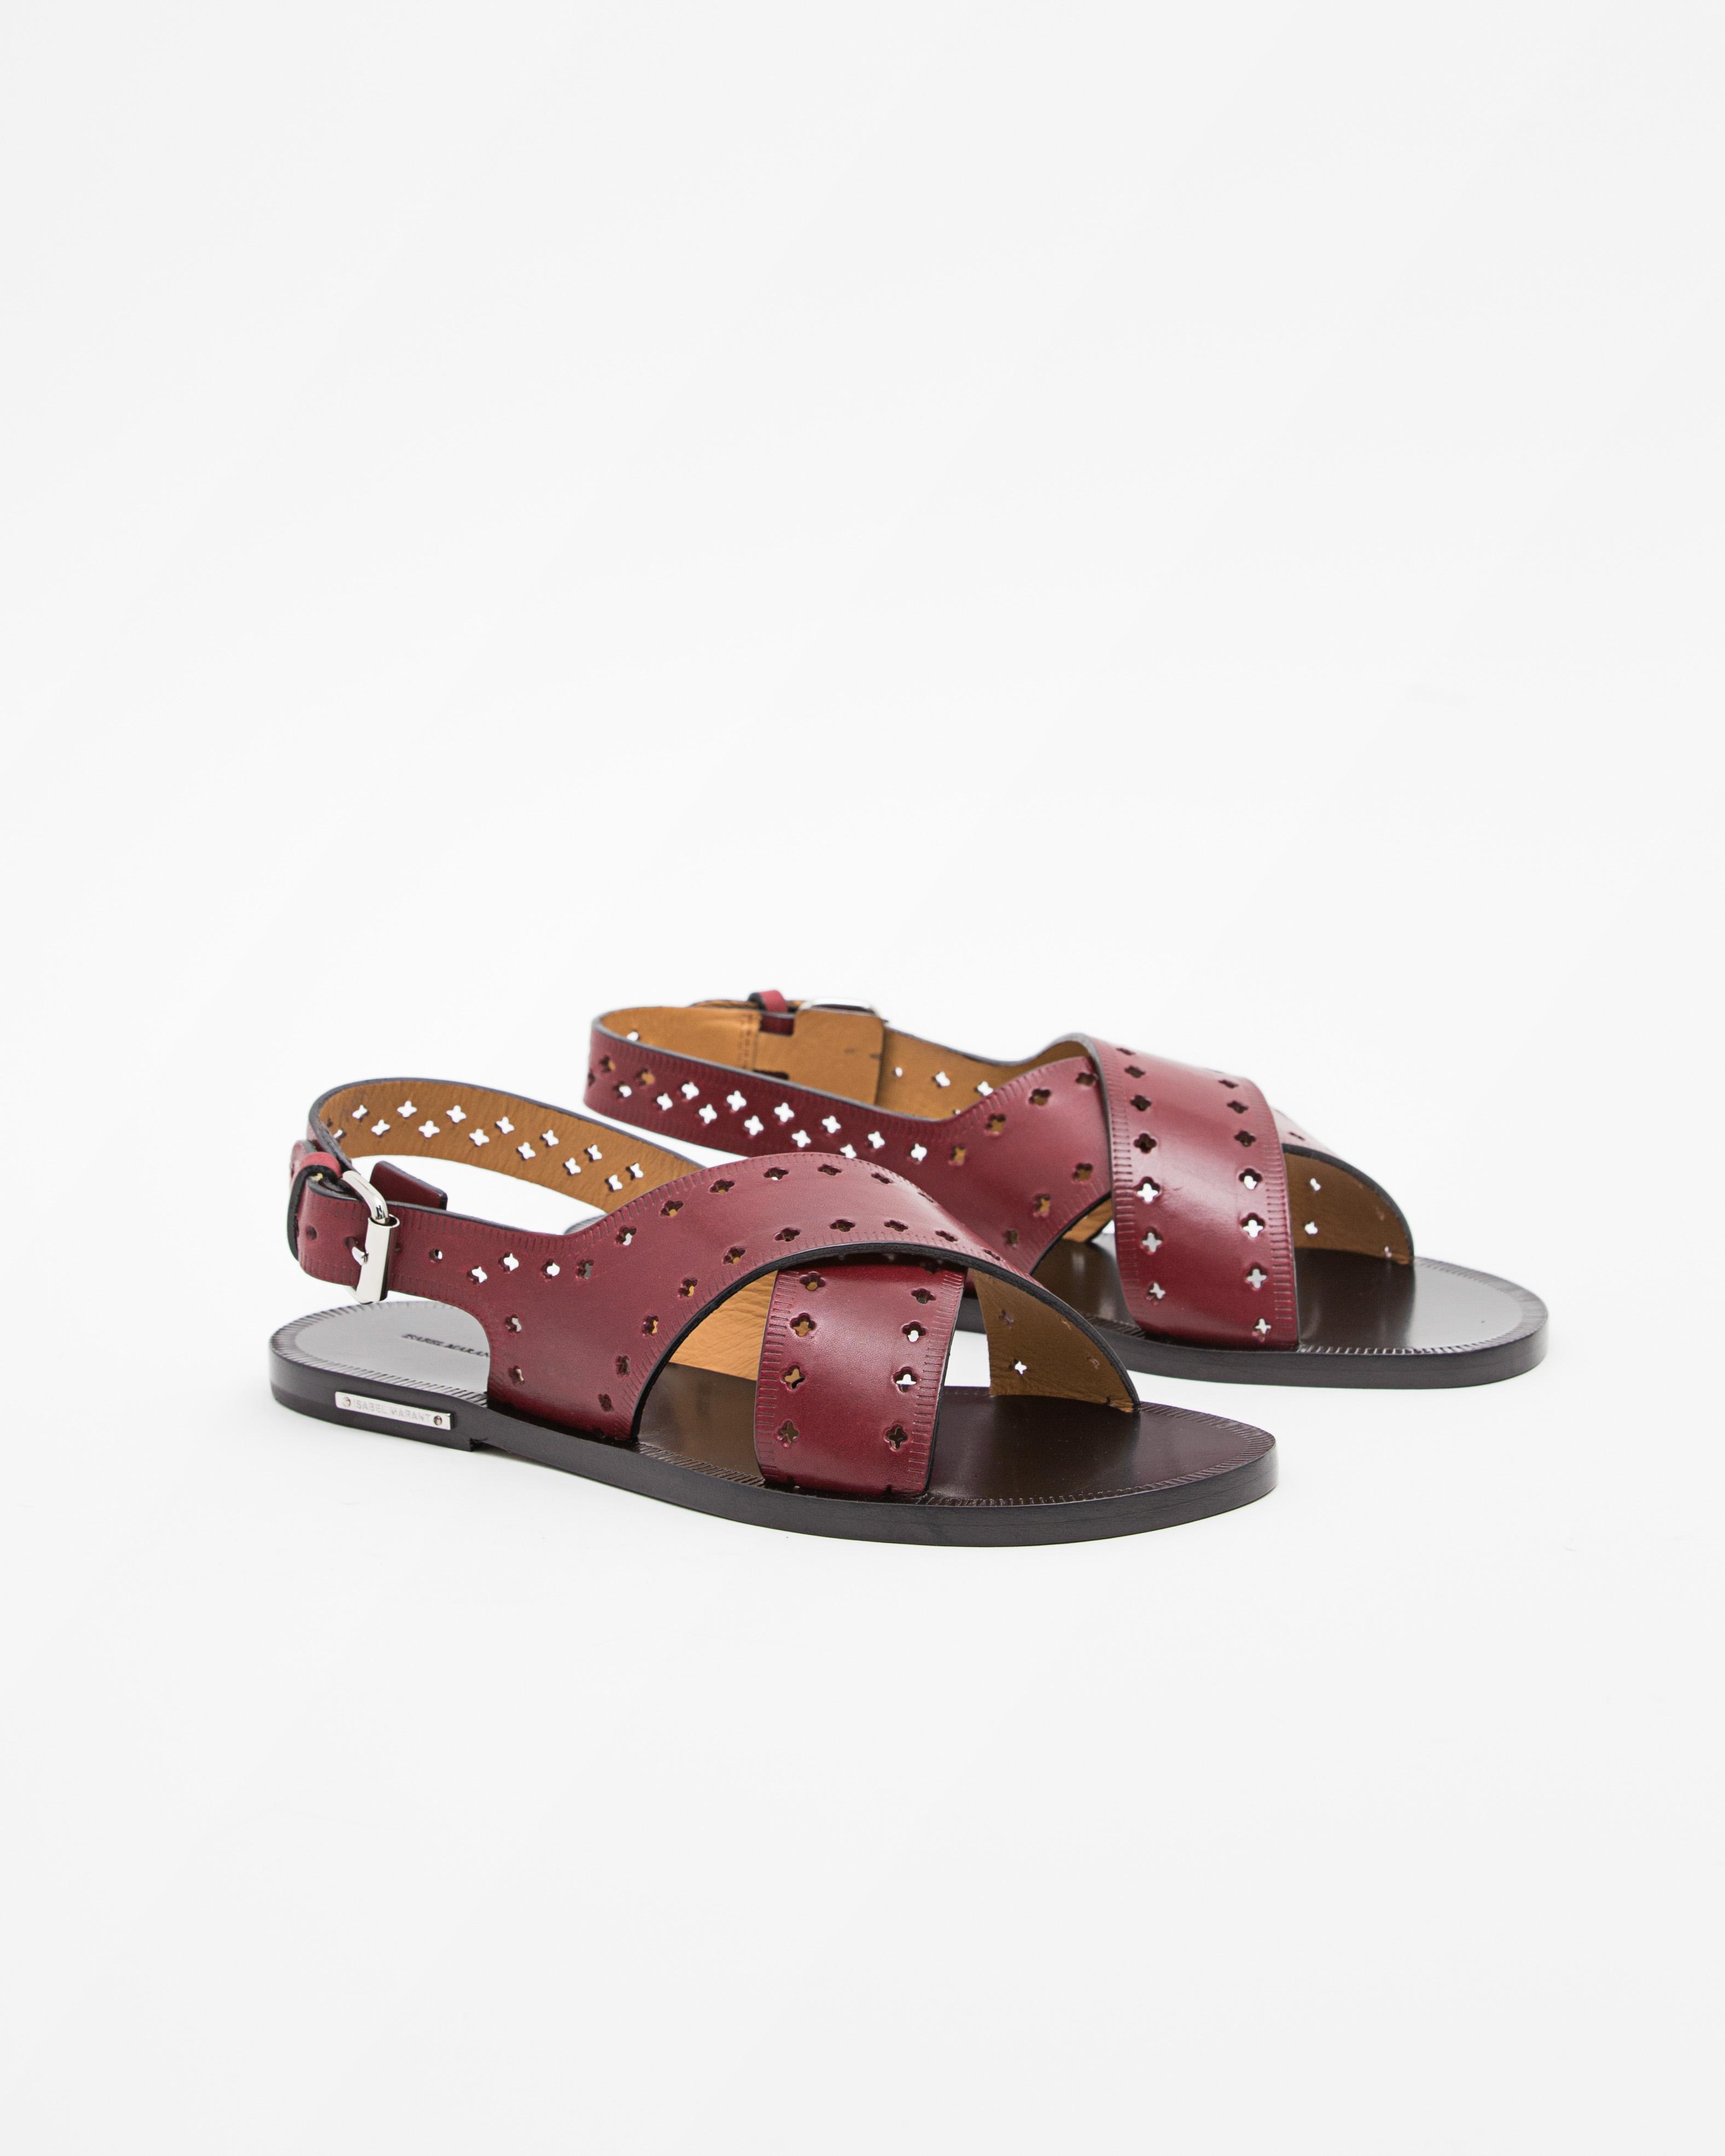 Isabel Marant Etoile 1 - Jerys Criss Cross Sandal